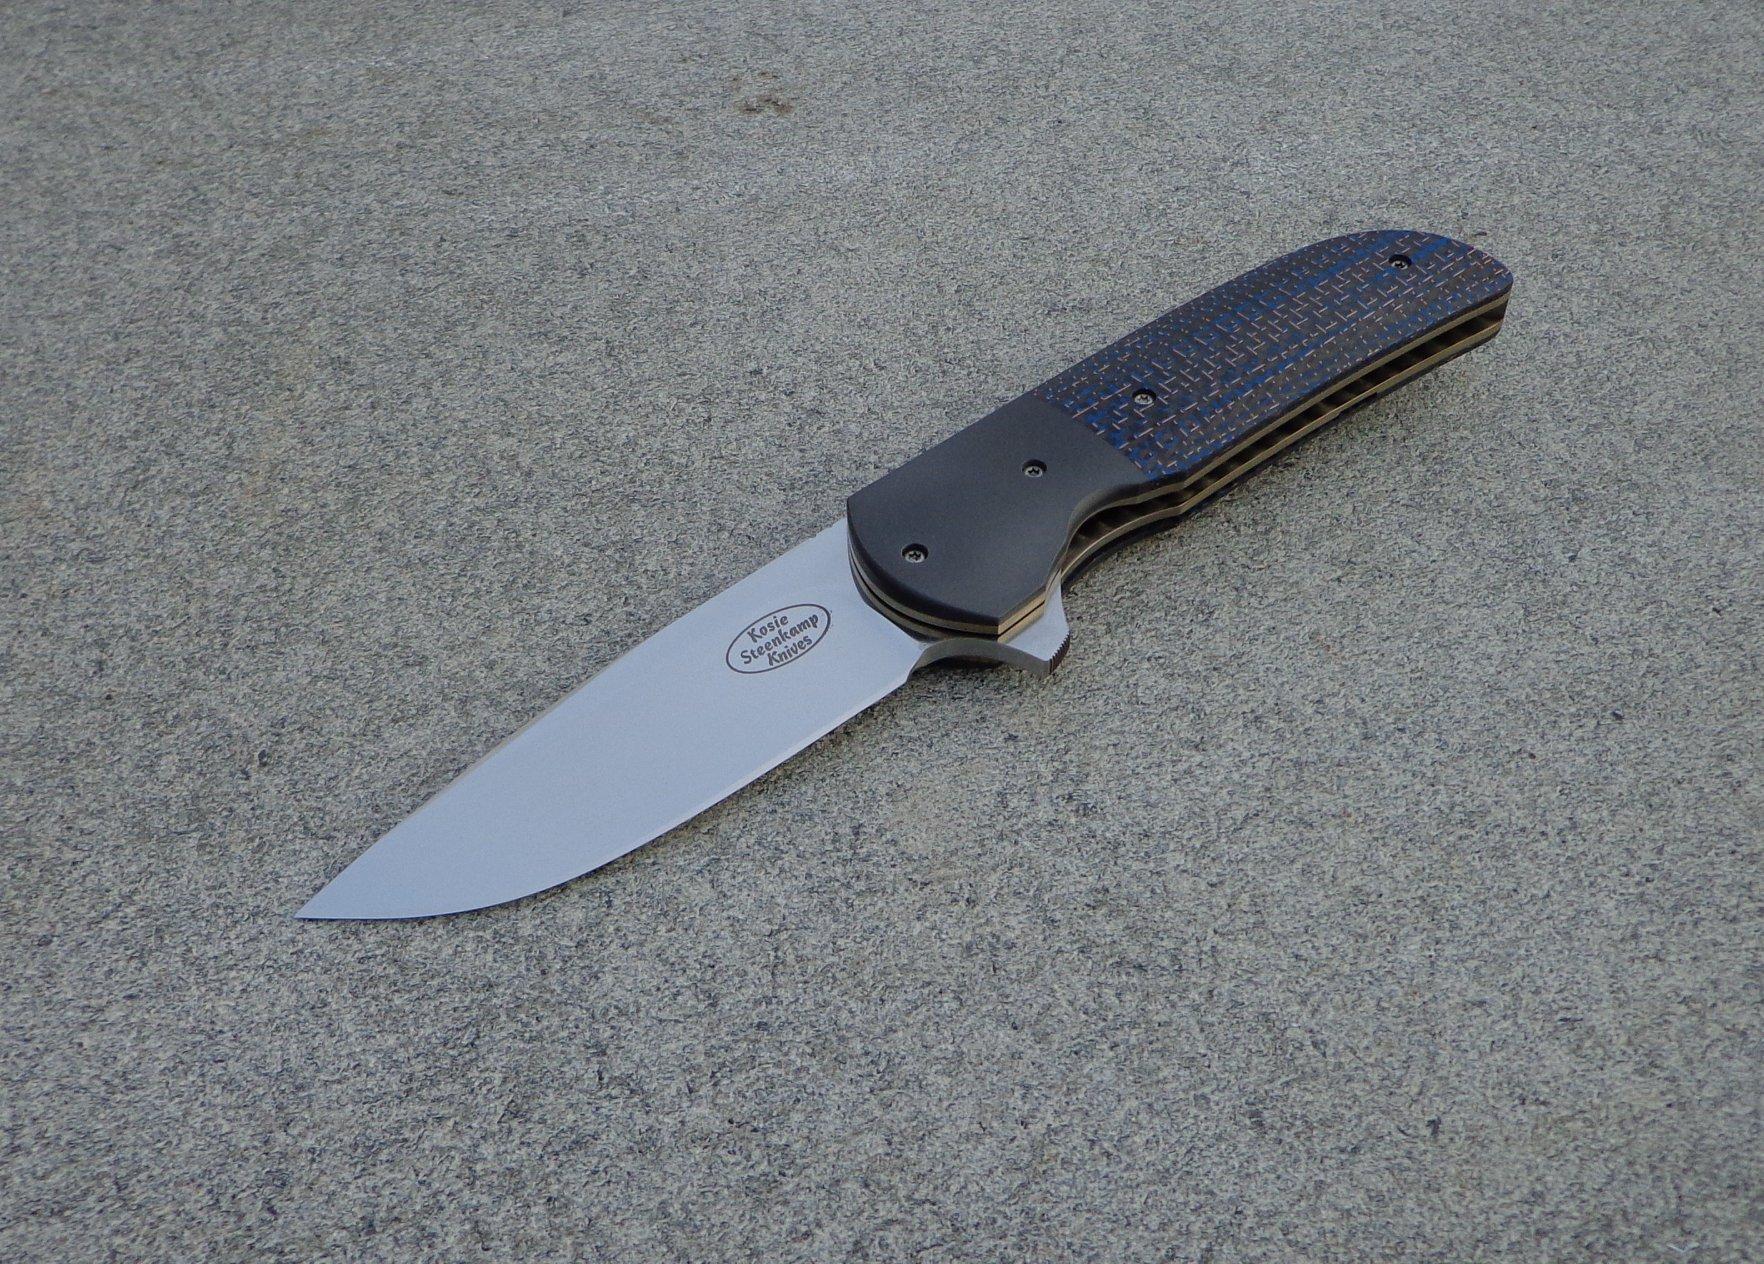 Knife: Majesty Flipper Liner Lock - IKBS. Blade: Böhler M390 Stainless Steel. Liners: Titanium, anodized golden. Bolsters: Zirconium. Handle scales: Blue Lightning Strike Carbon Fiber with anodized Titanium belt clip.